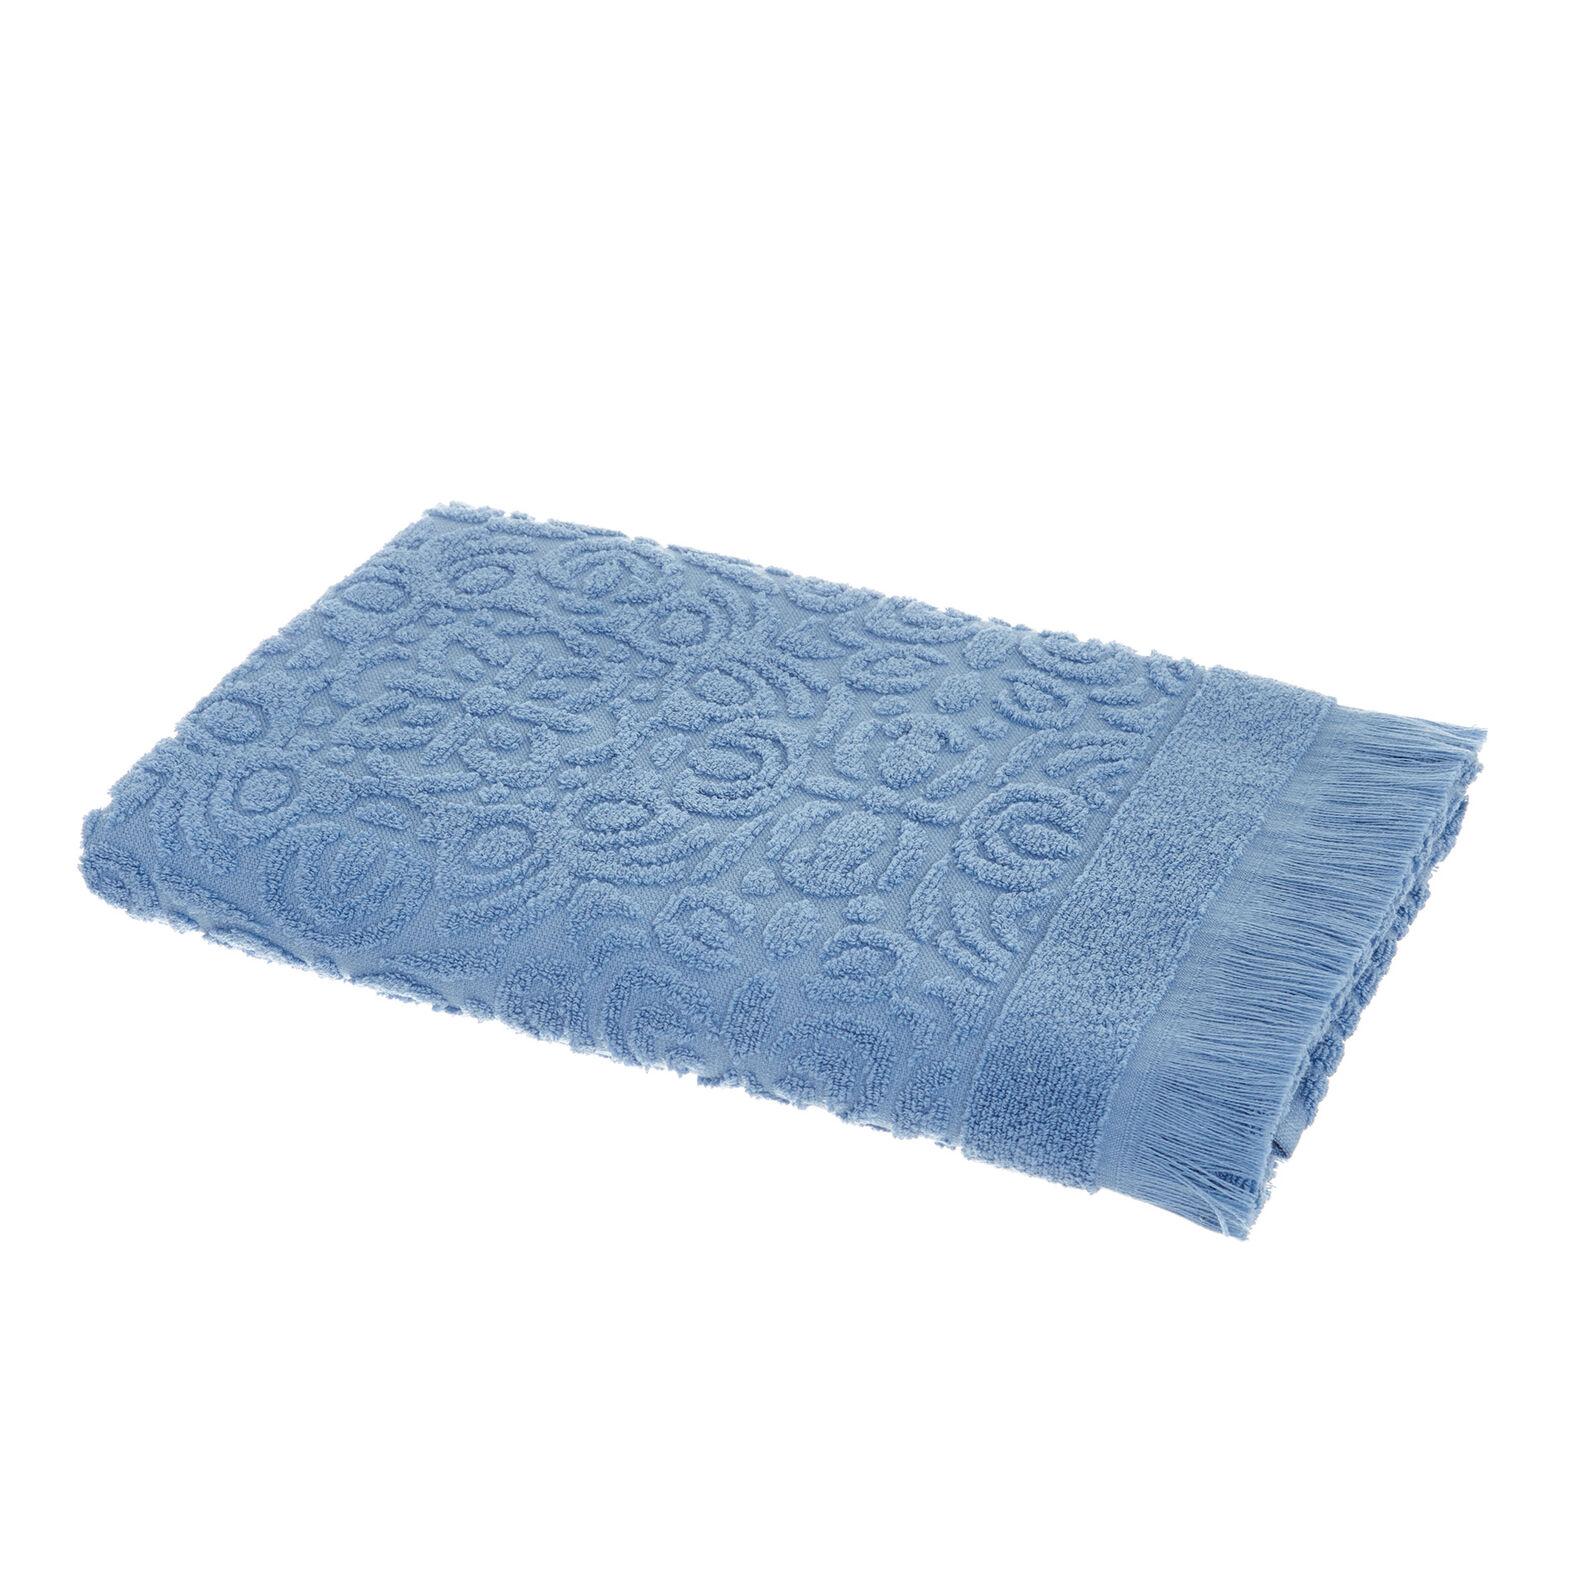 Asciugamano puro cotone jacquard